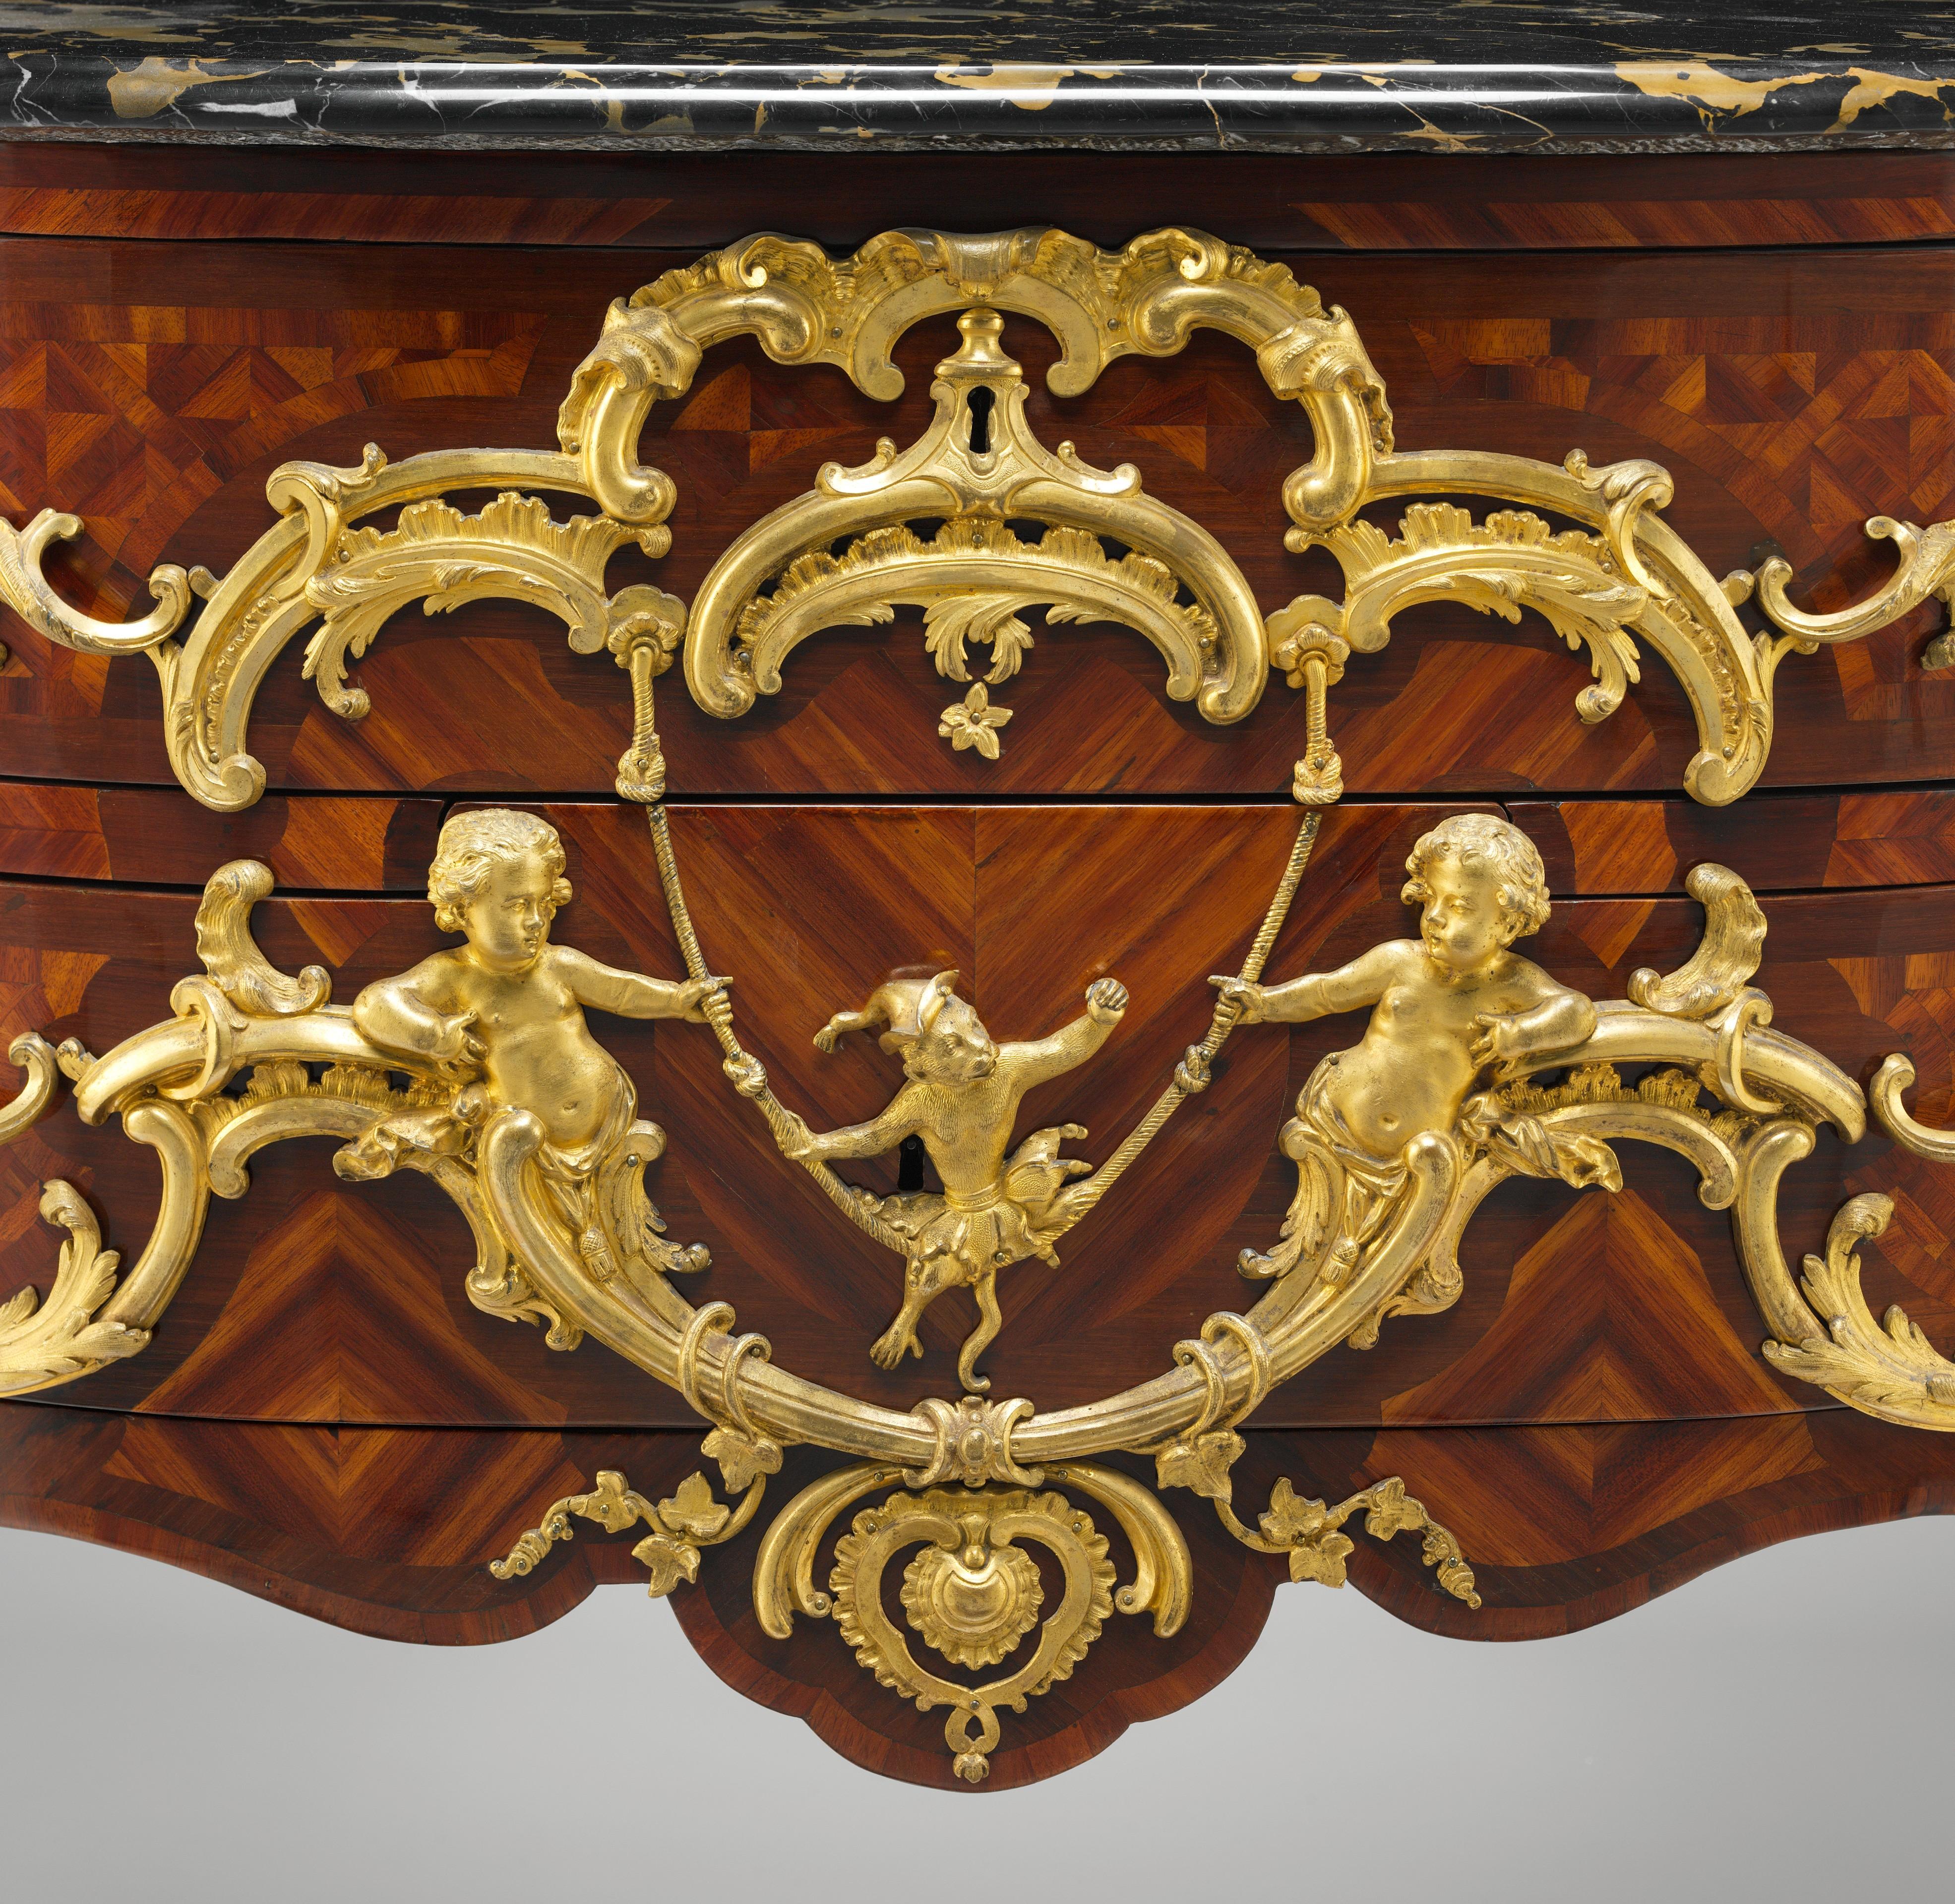 Chaise Style Art Nouveau louis xv furniture - wikipedia